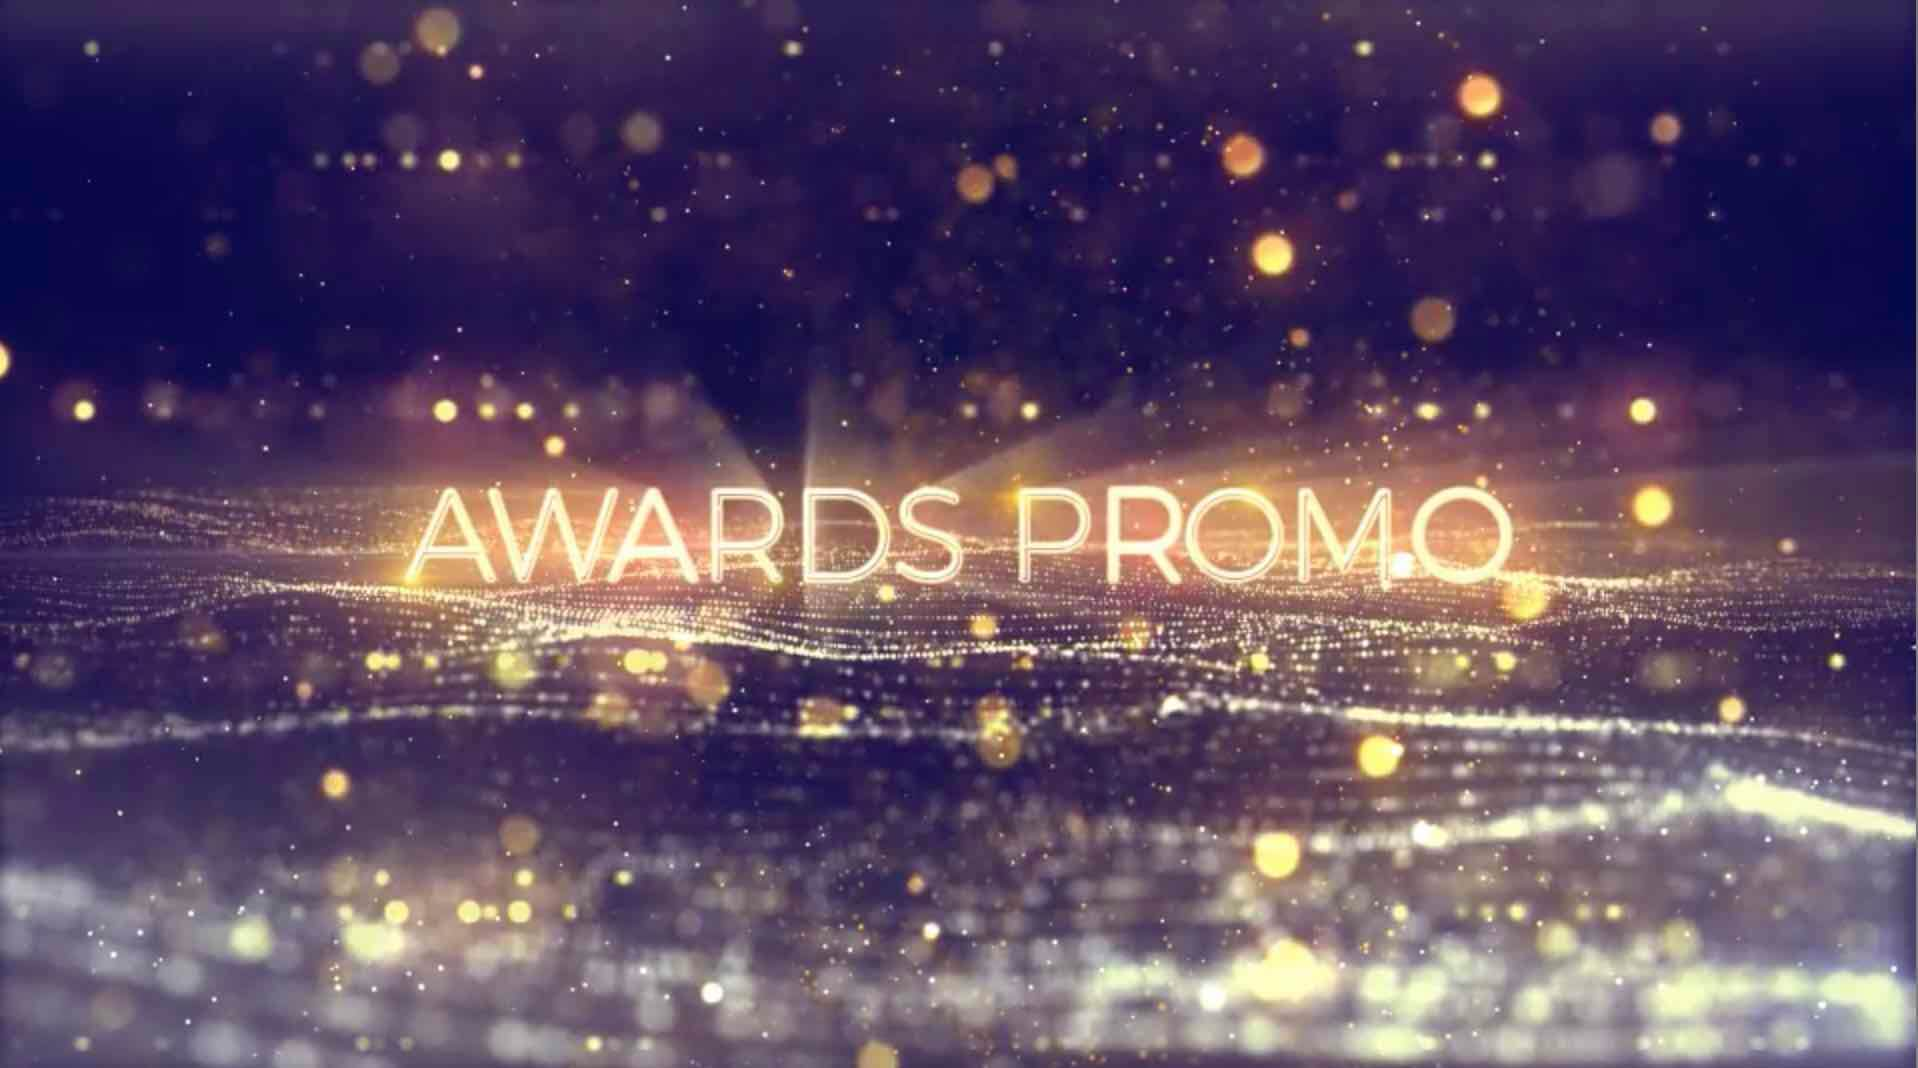 AE模板-颁奖节目标题插图